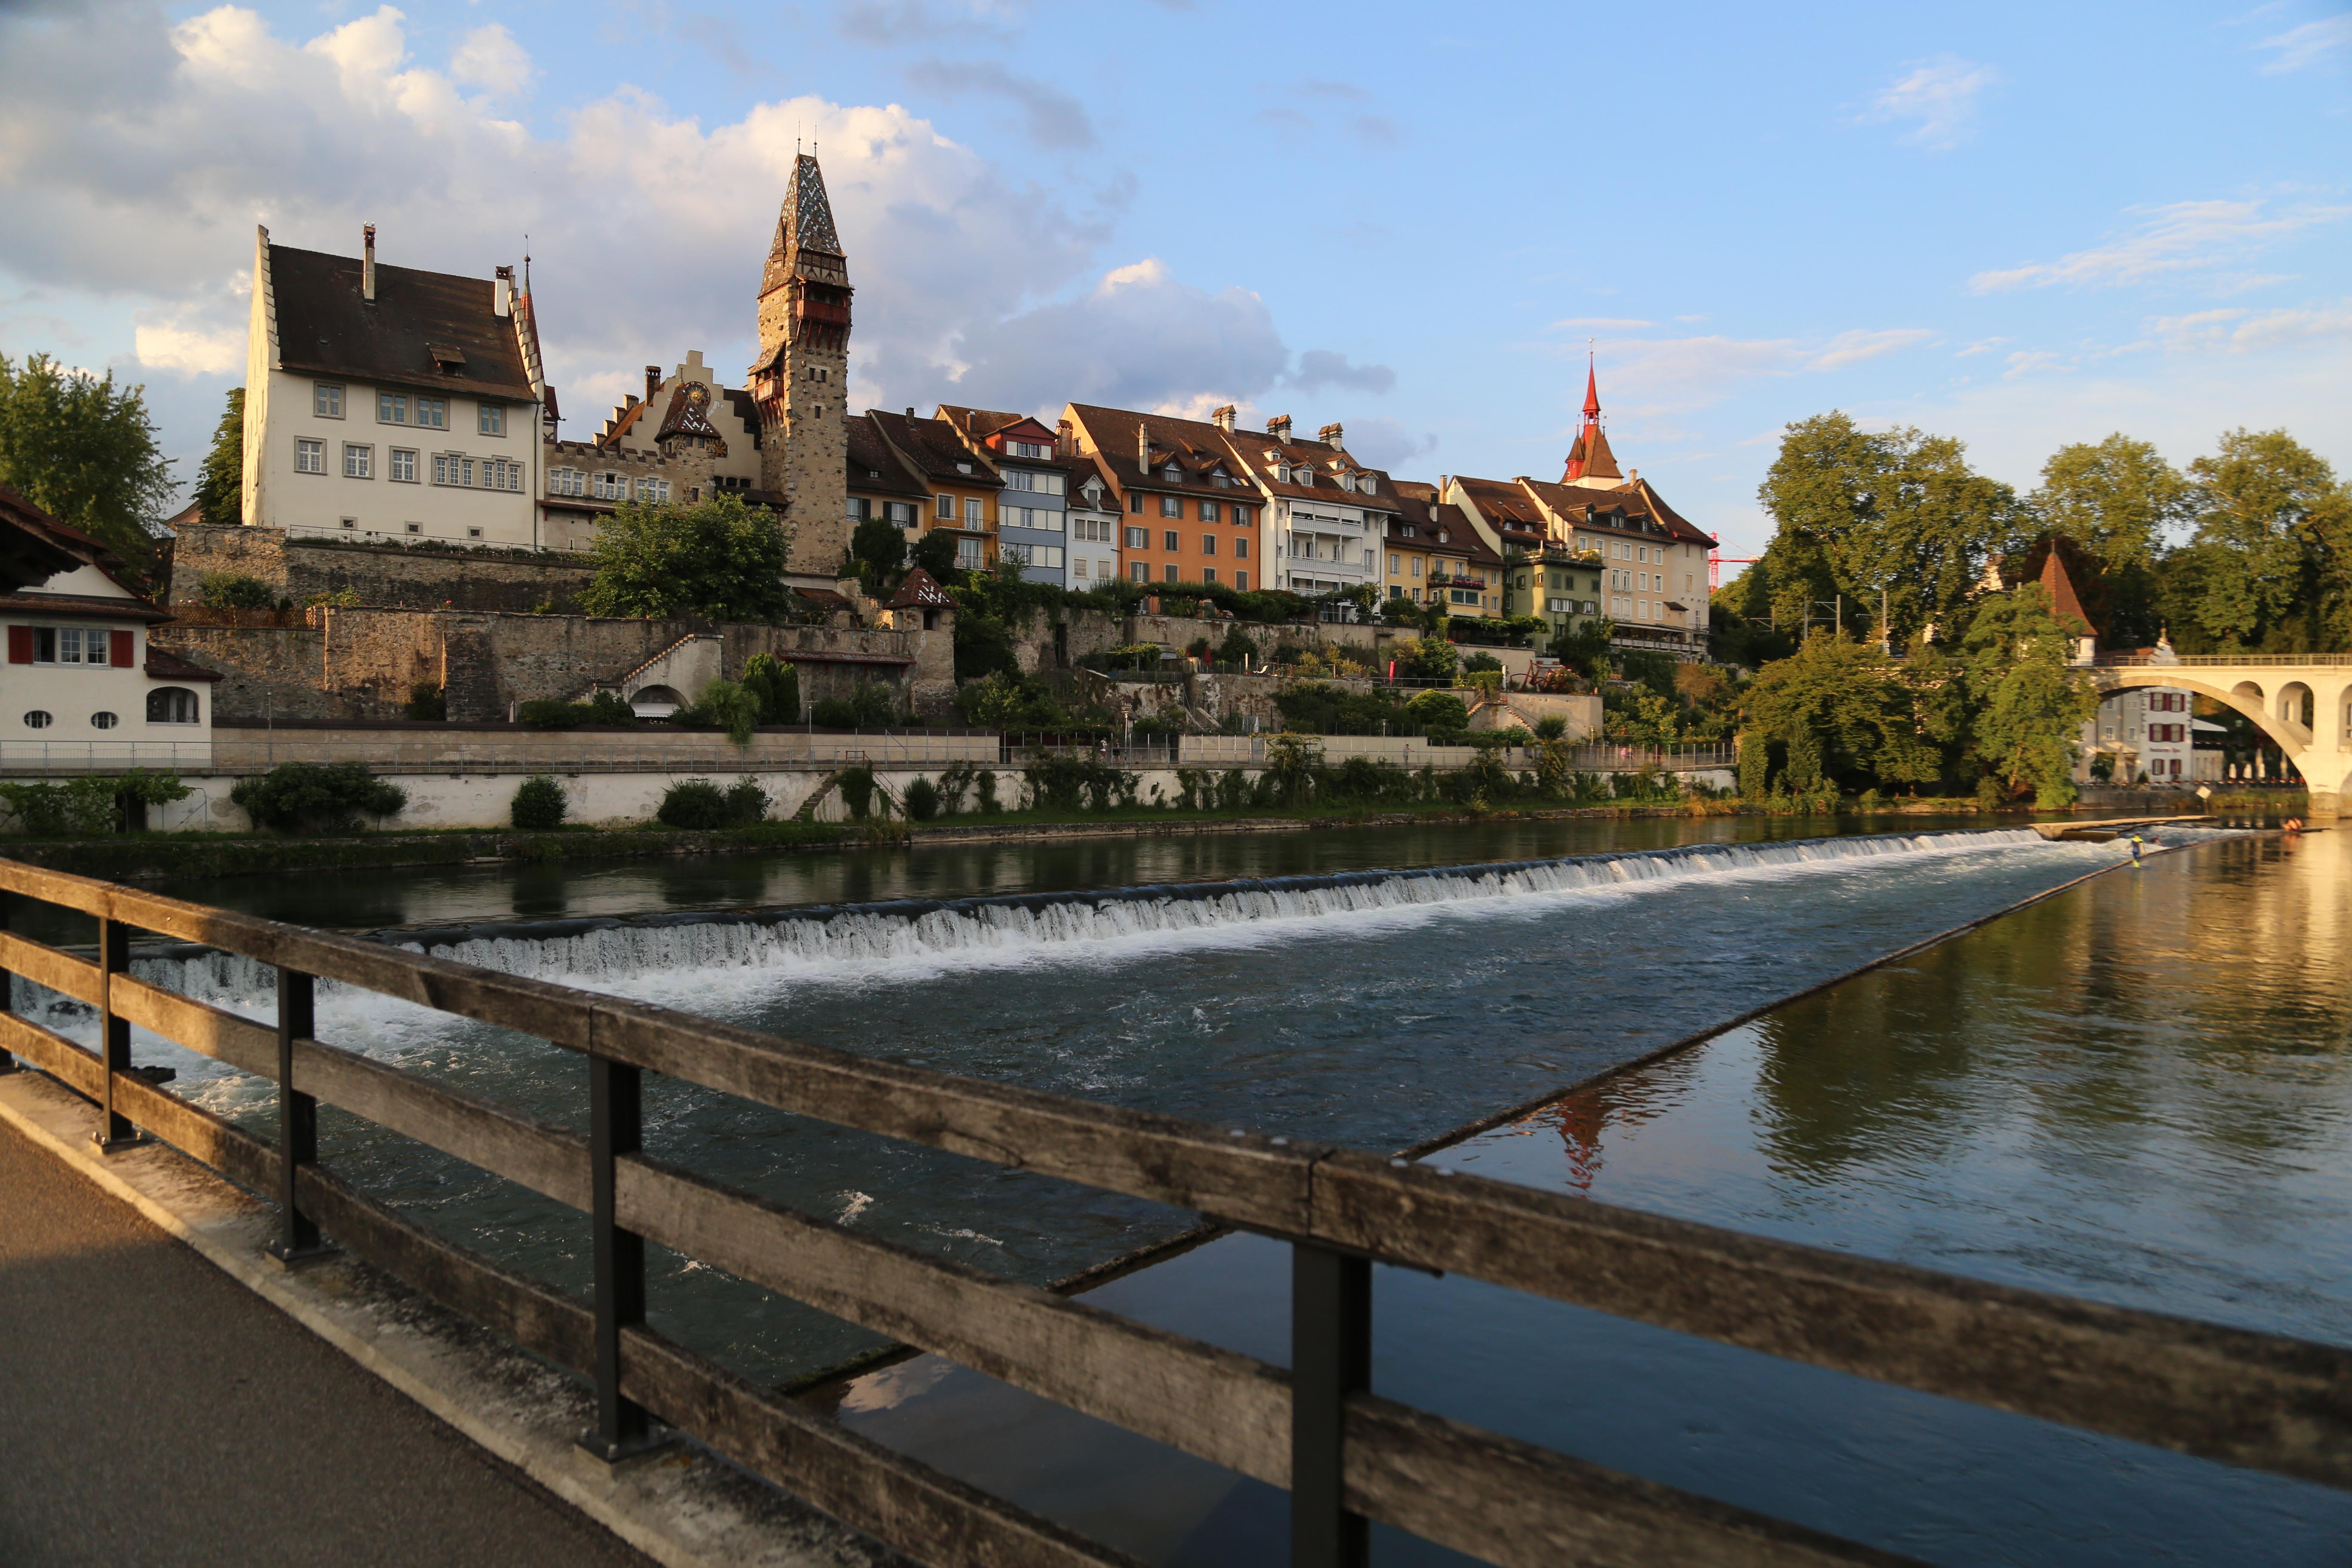 Stadtführung in Bremgarten (Deutsch)